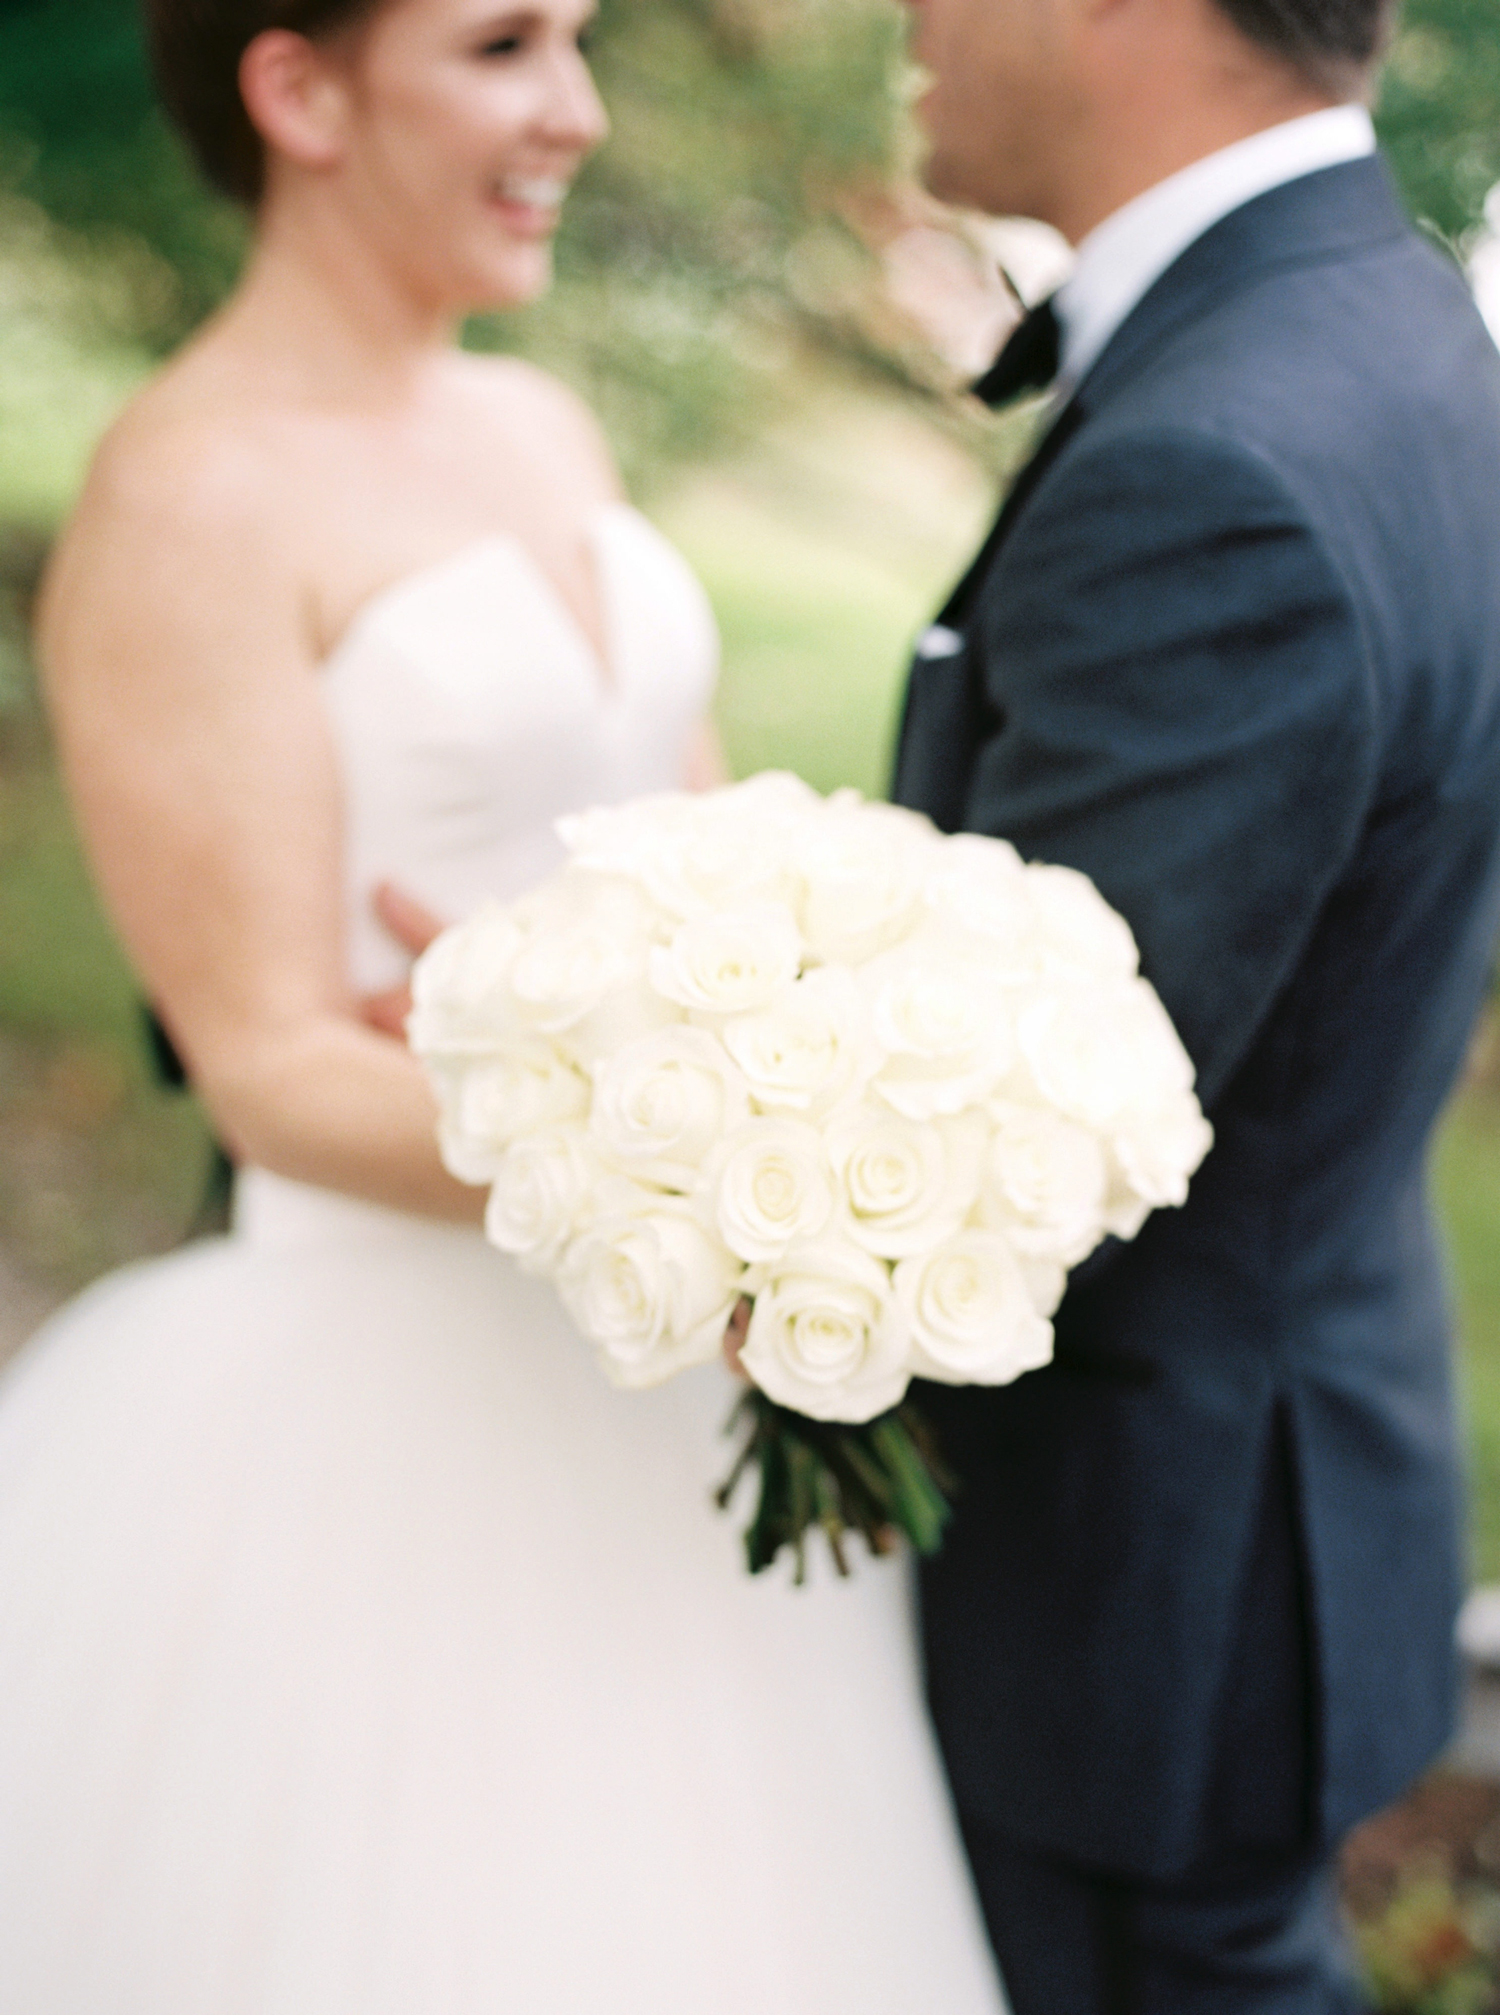 single flower wedding bouquet white roses held by bride embracing groom